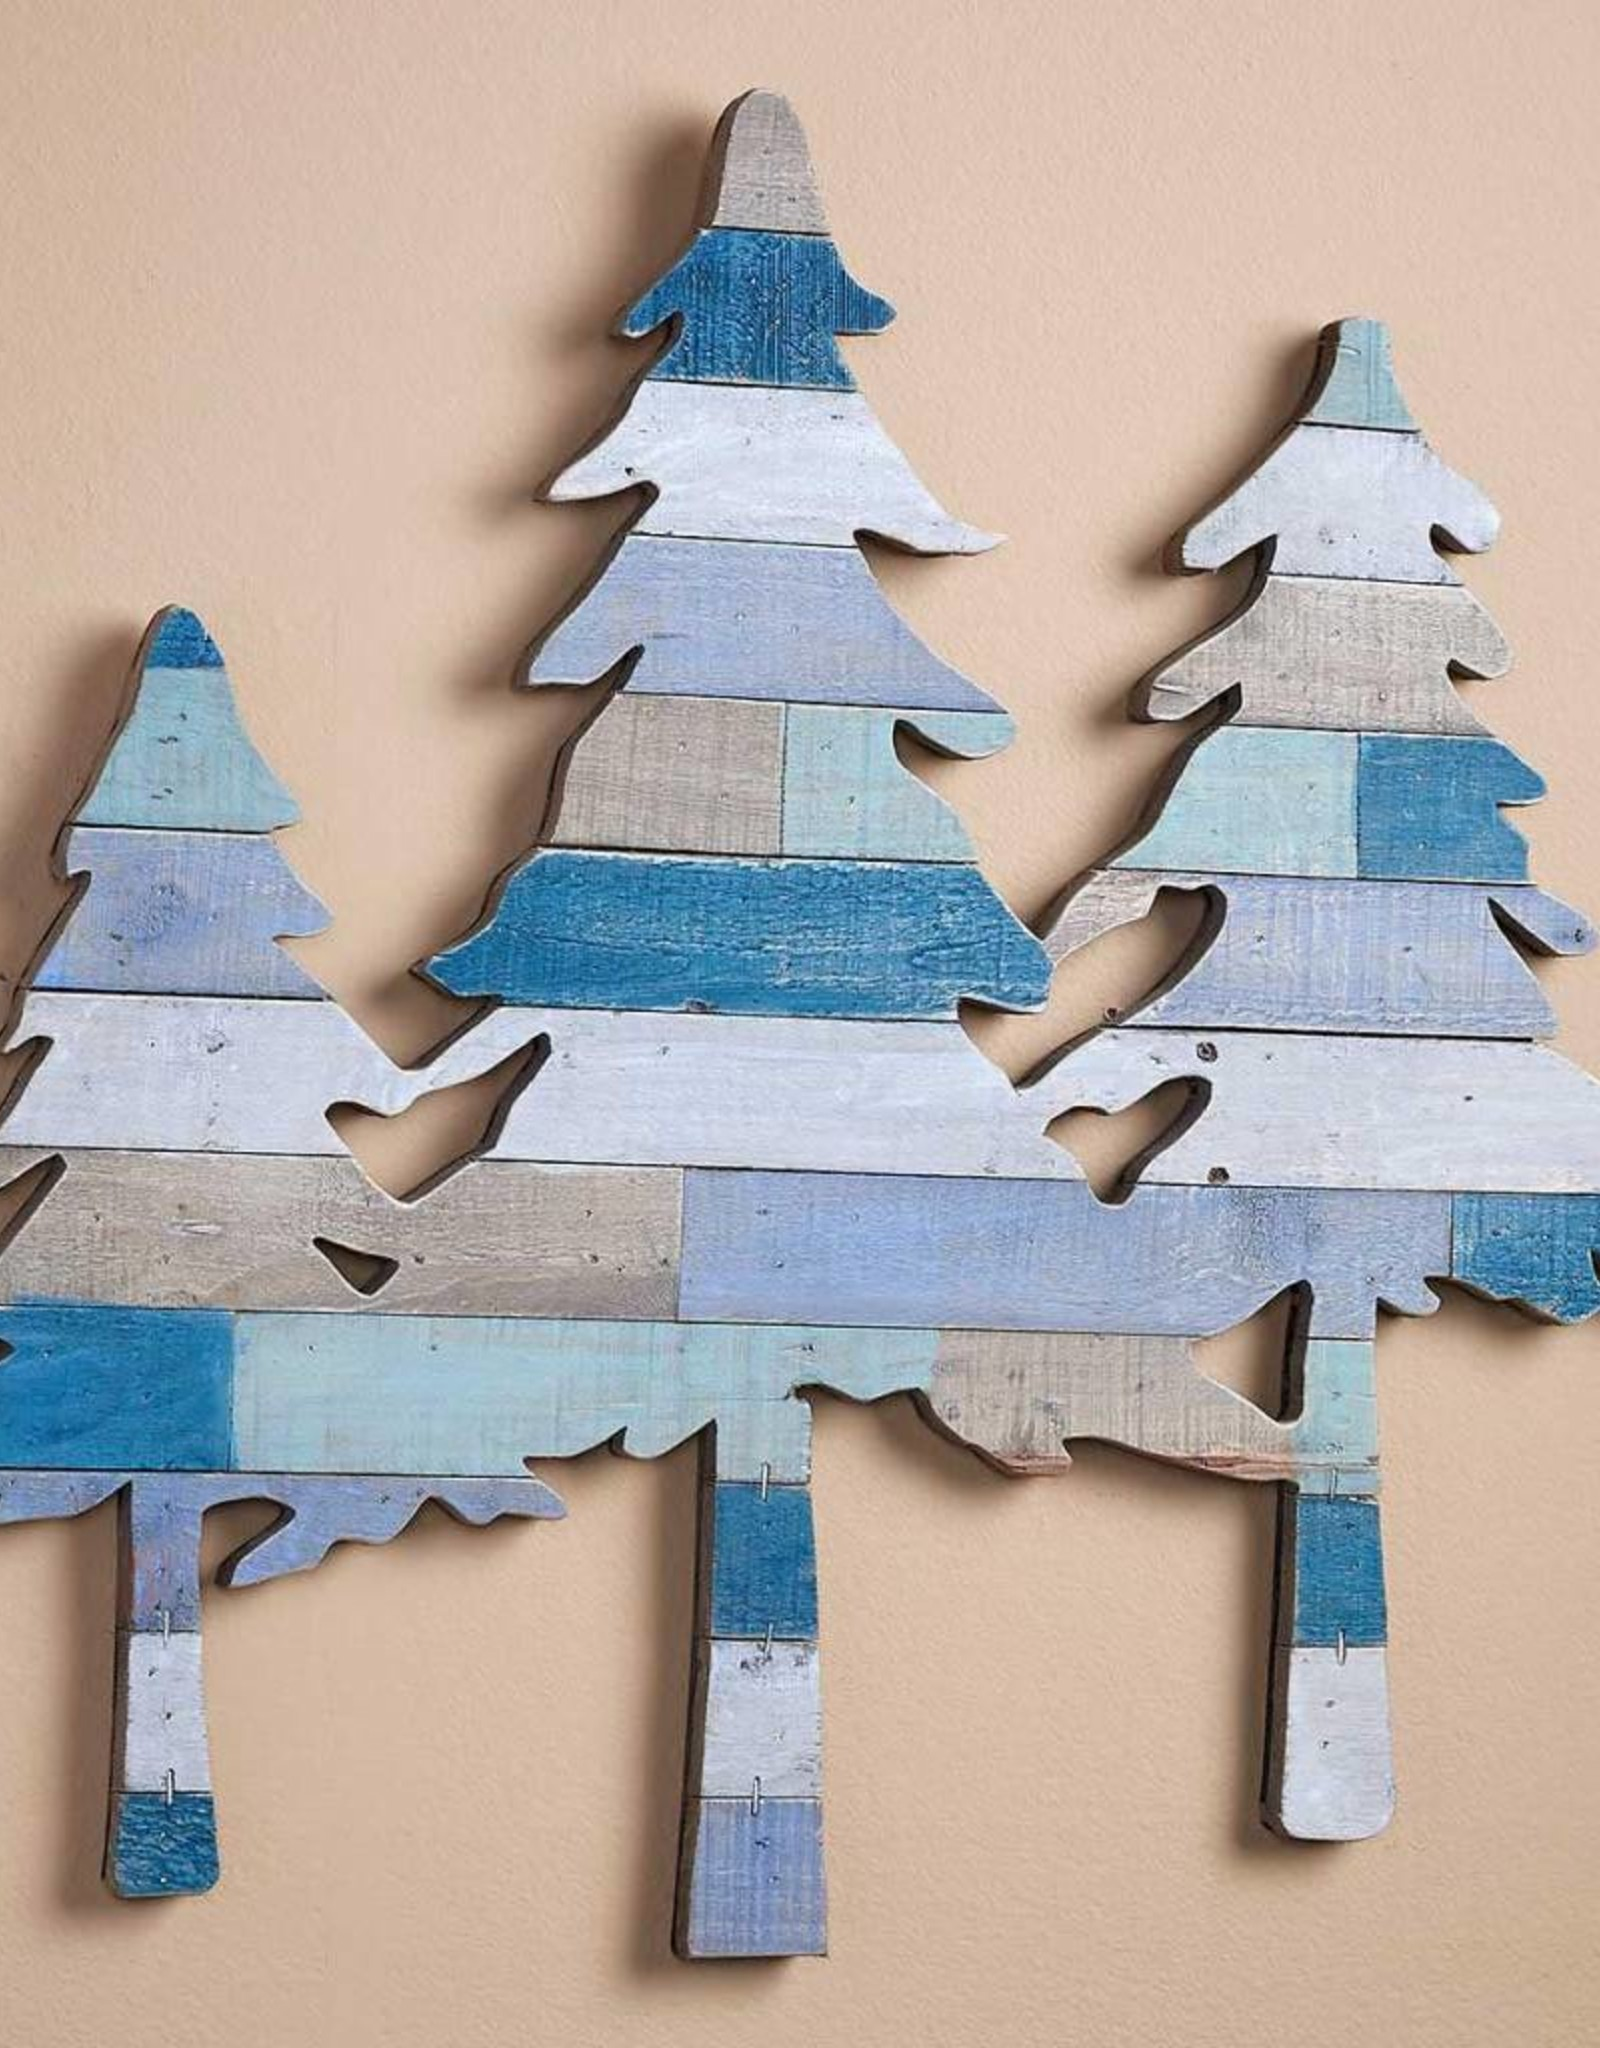 Slat Wood Wall Decor - Pine Tree